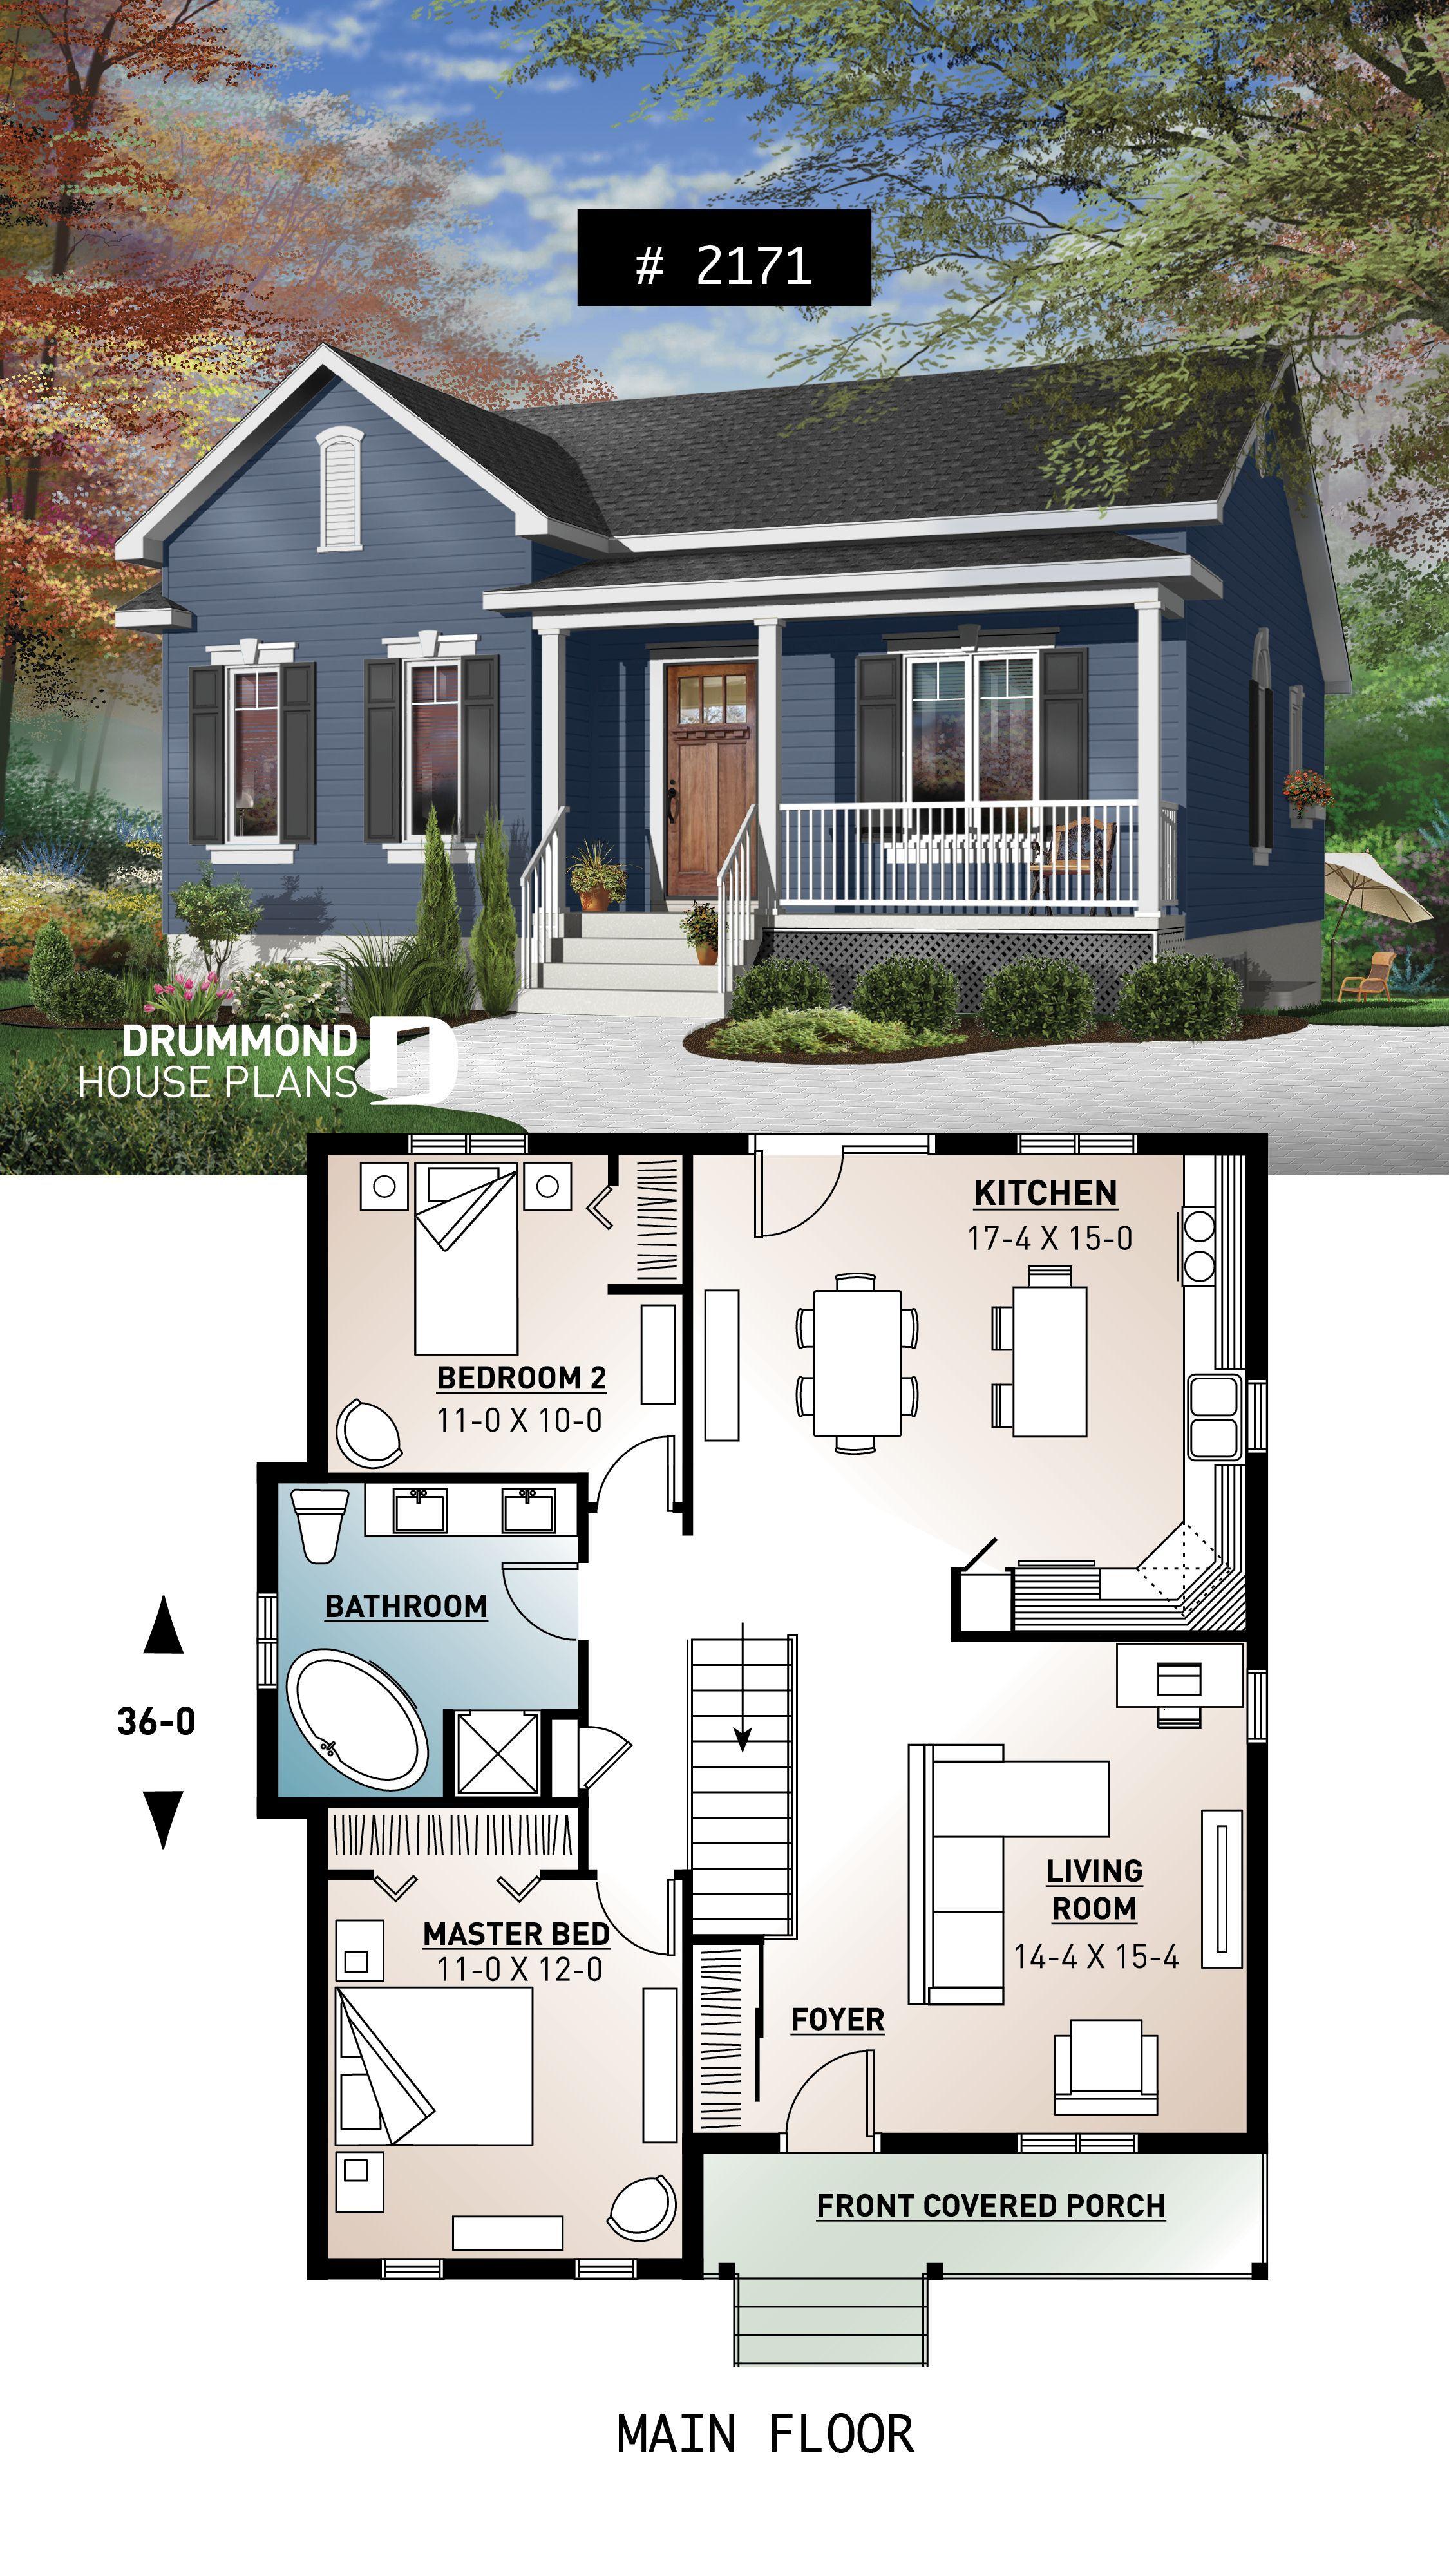 One Story Economical Home With Open Floor Plan Kitchen With Island Small Affordable Homedesign Houseplan план дома планы коттеджей план маленького дома